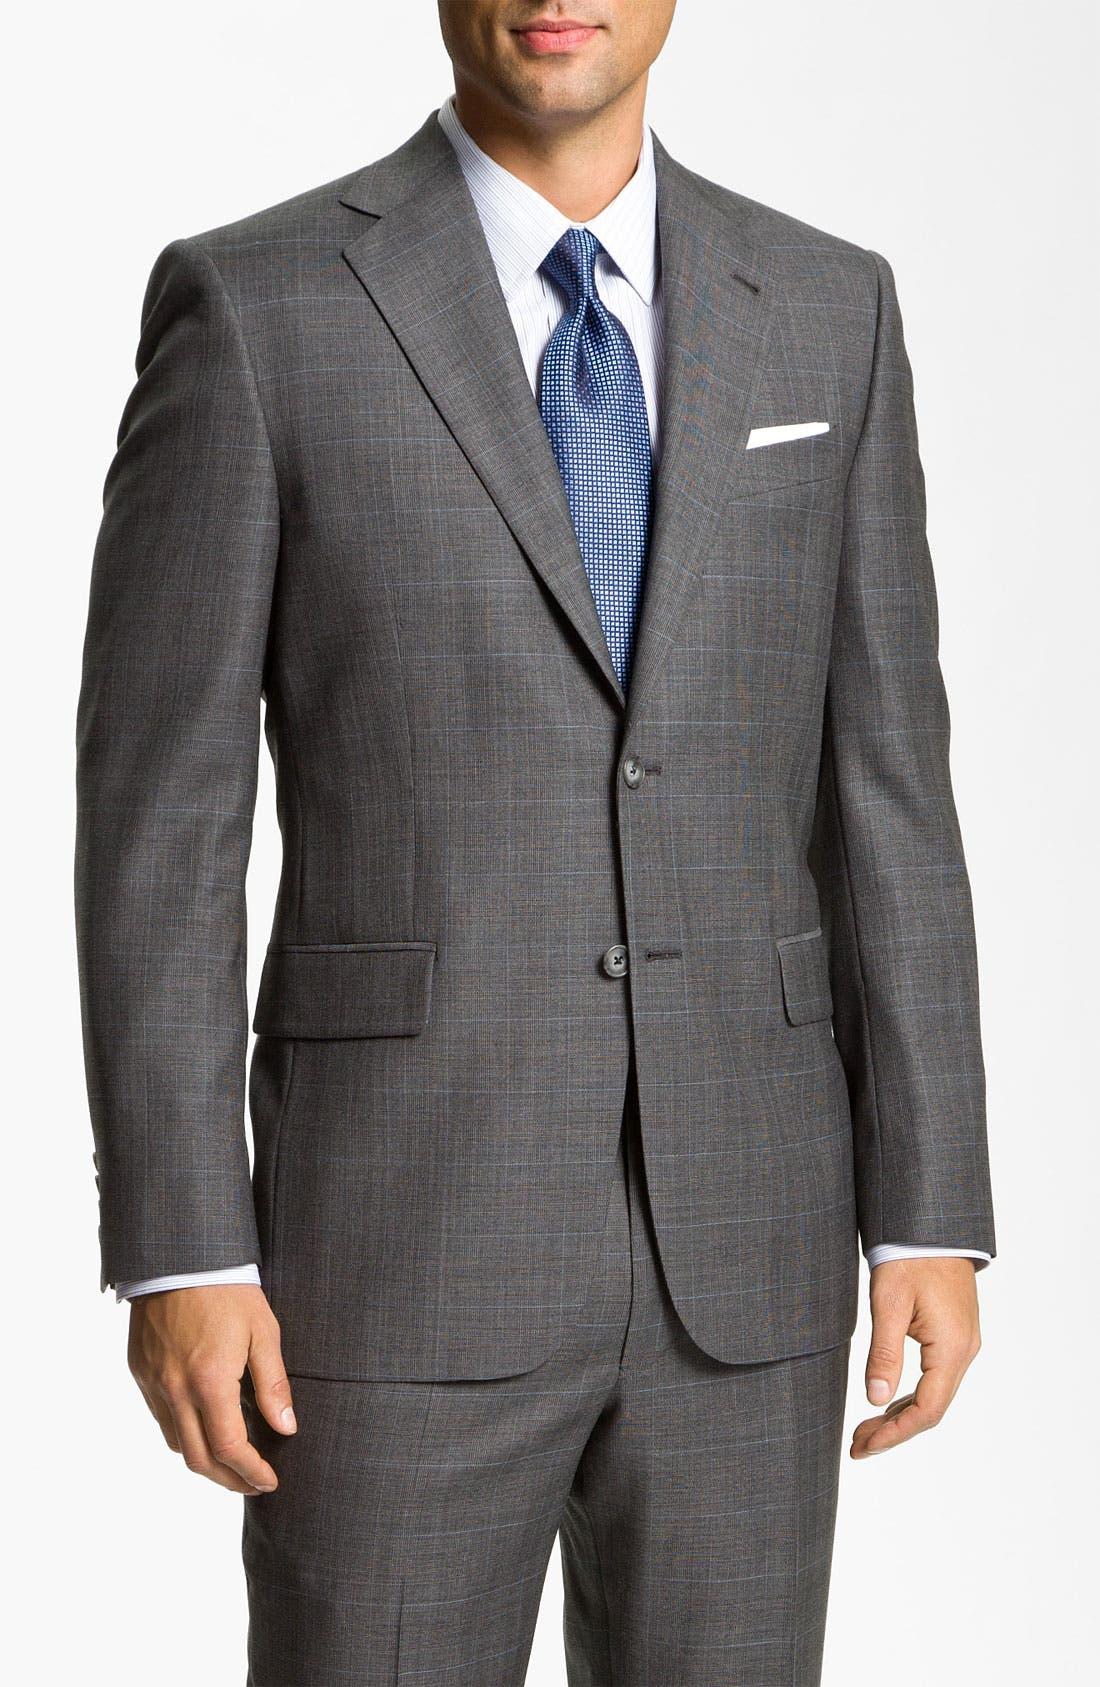 Alternate Image 1 Selected - Joseph Abboud 'Signature Silver' Plaid Suit